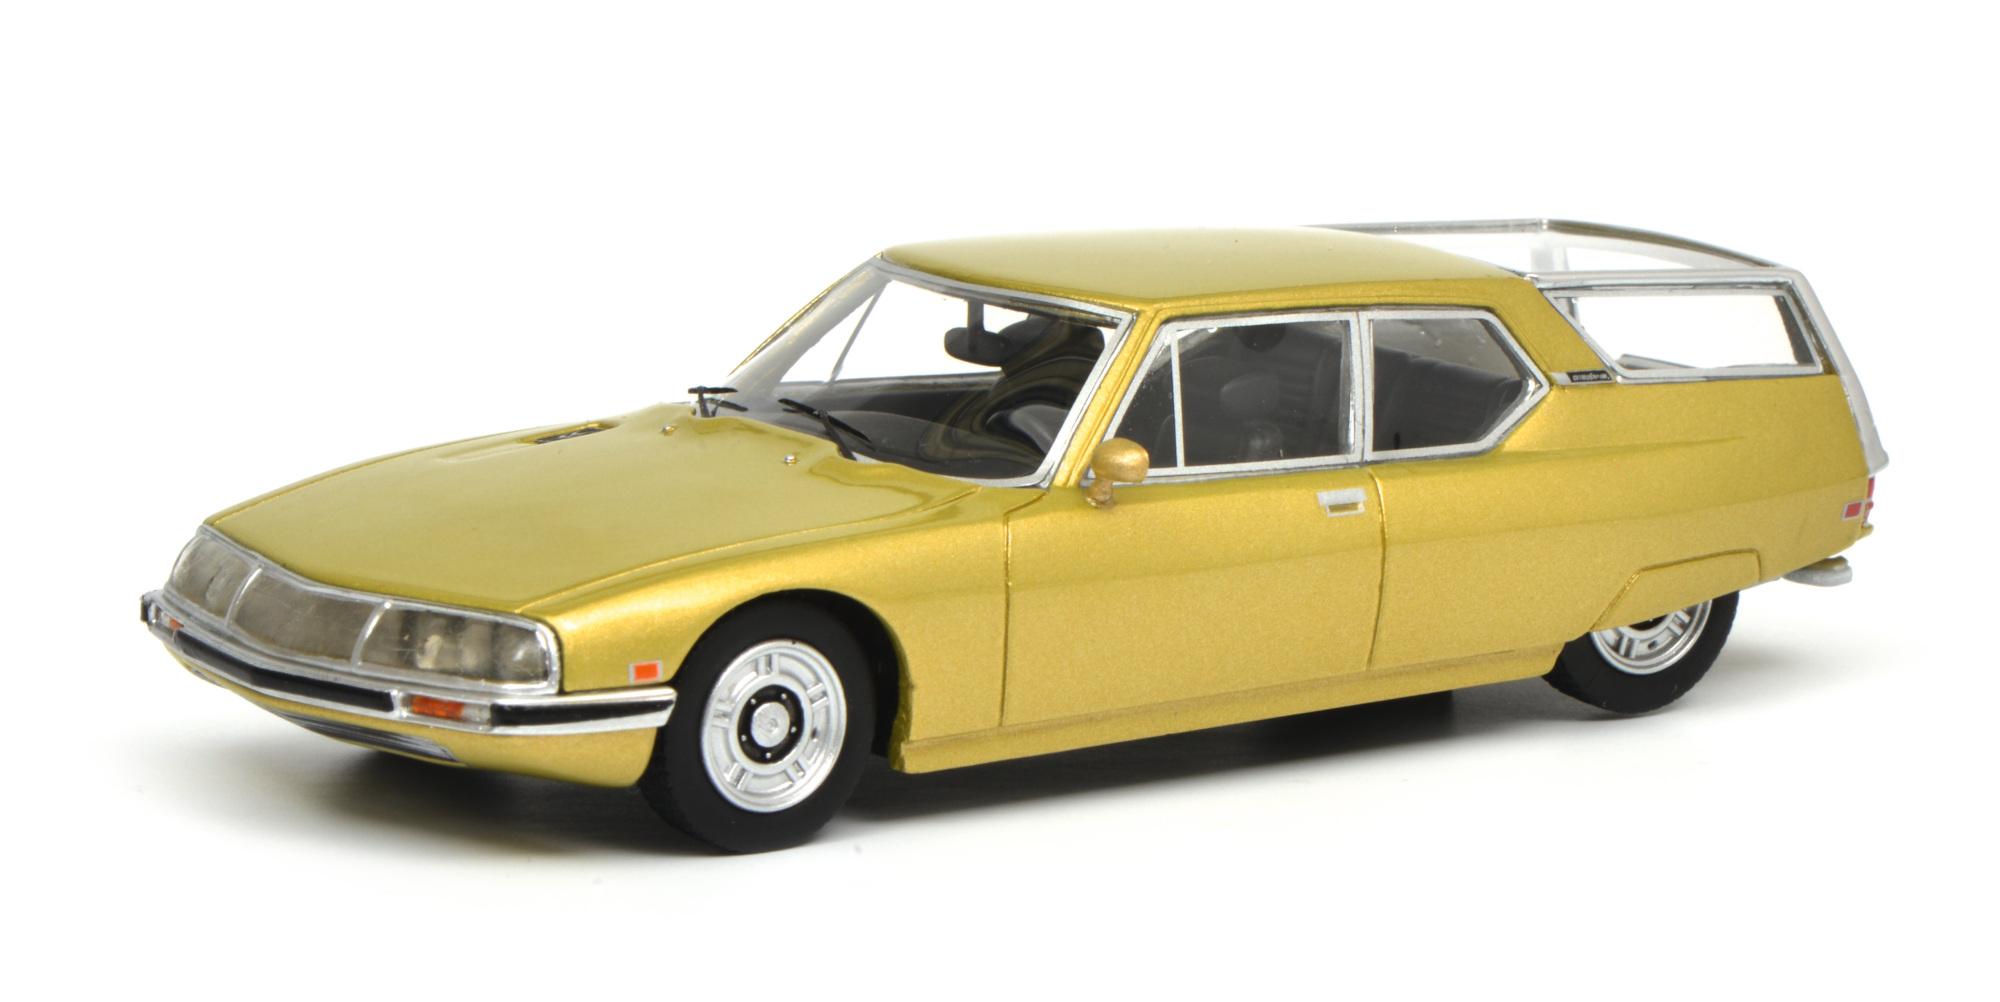 ds automodelle modellbauvertrieb schuco 1 43 citroen sm. Black Bedroom Furniture Sets. Home Design Ideas